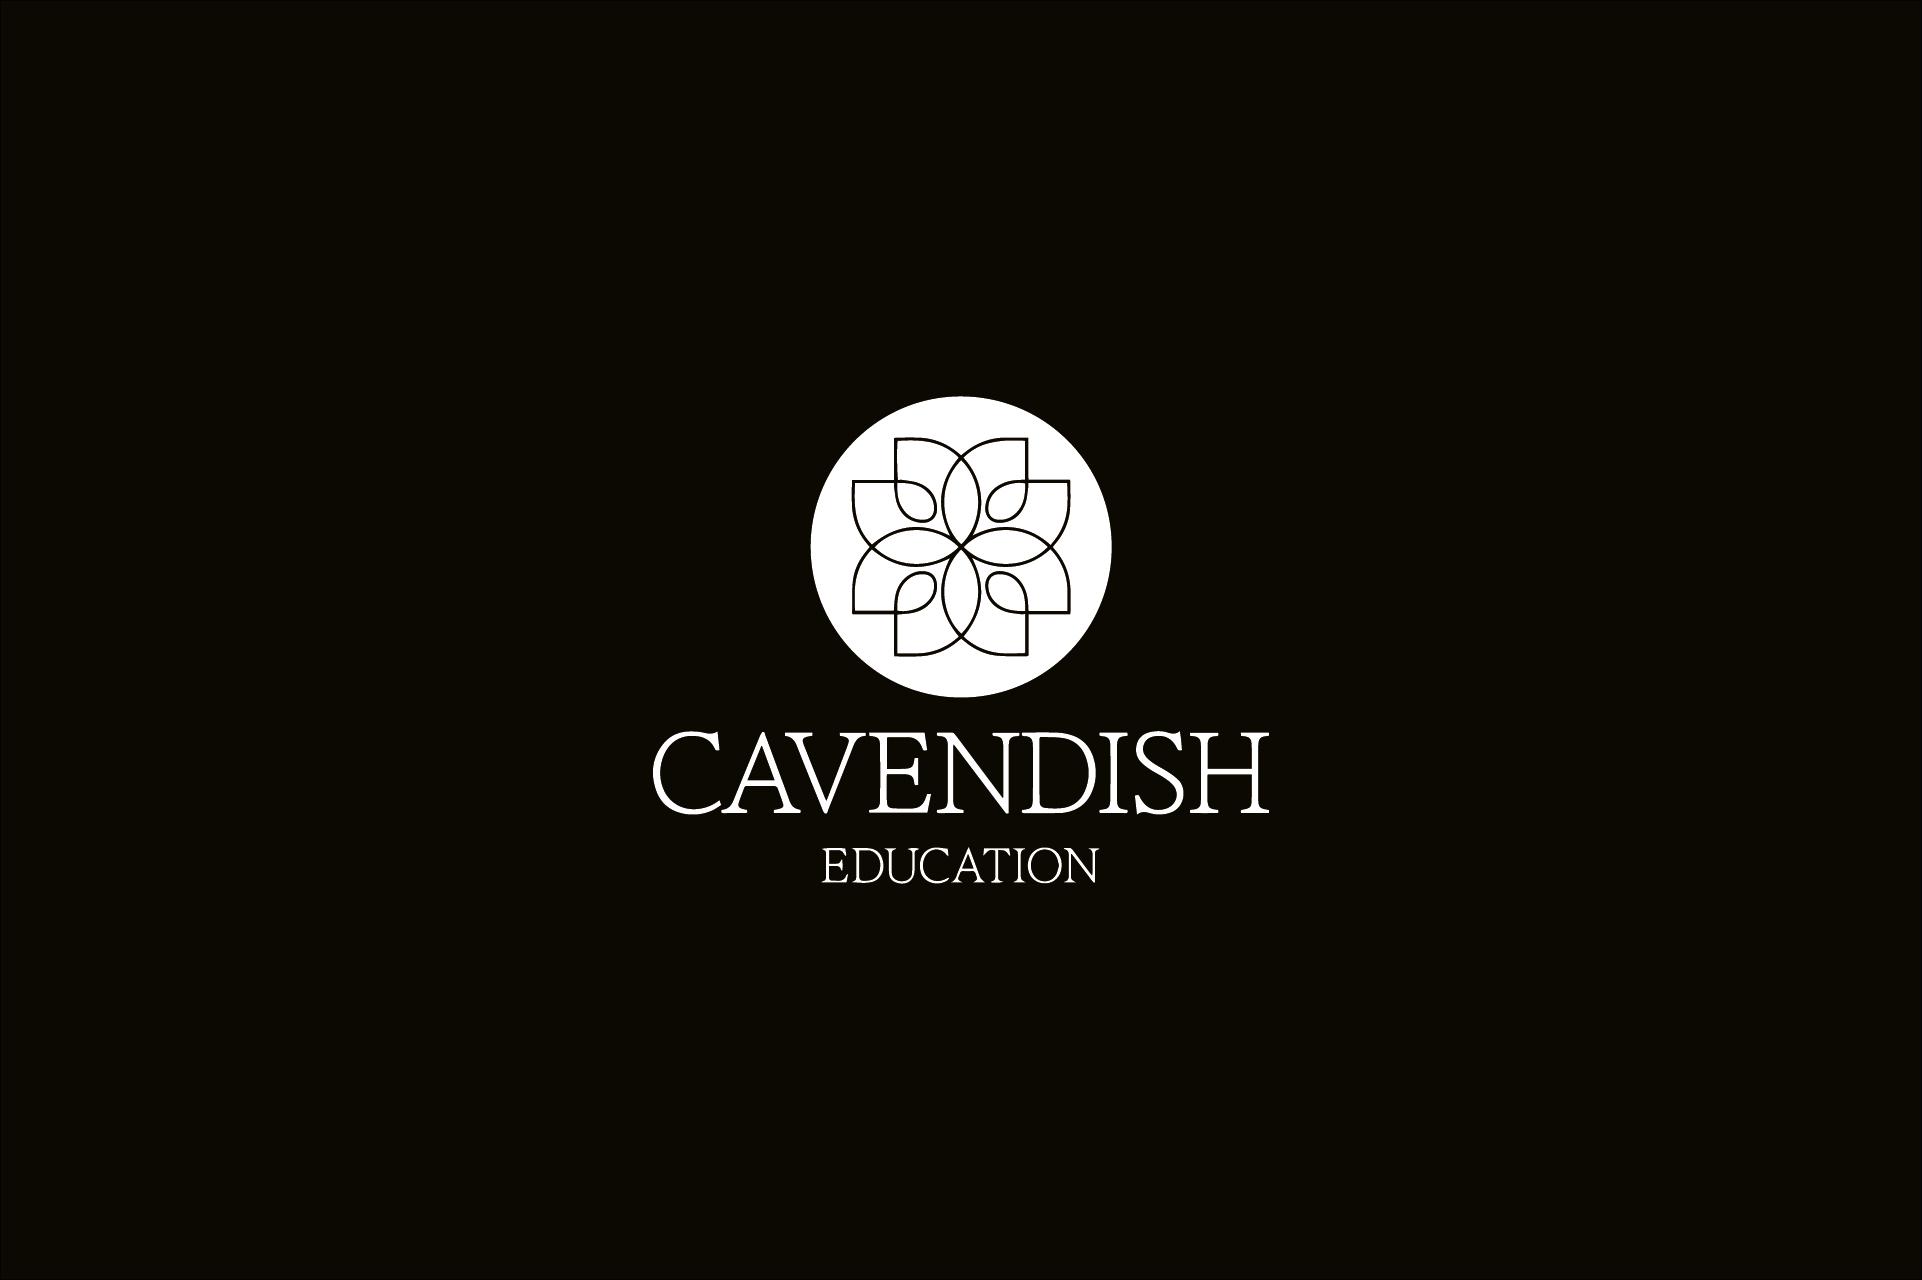 Cavendish Education